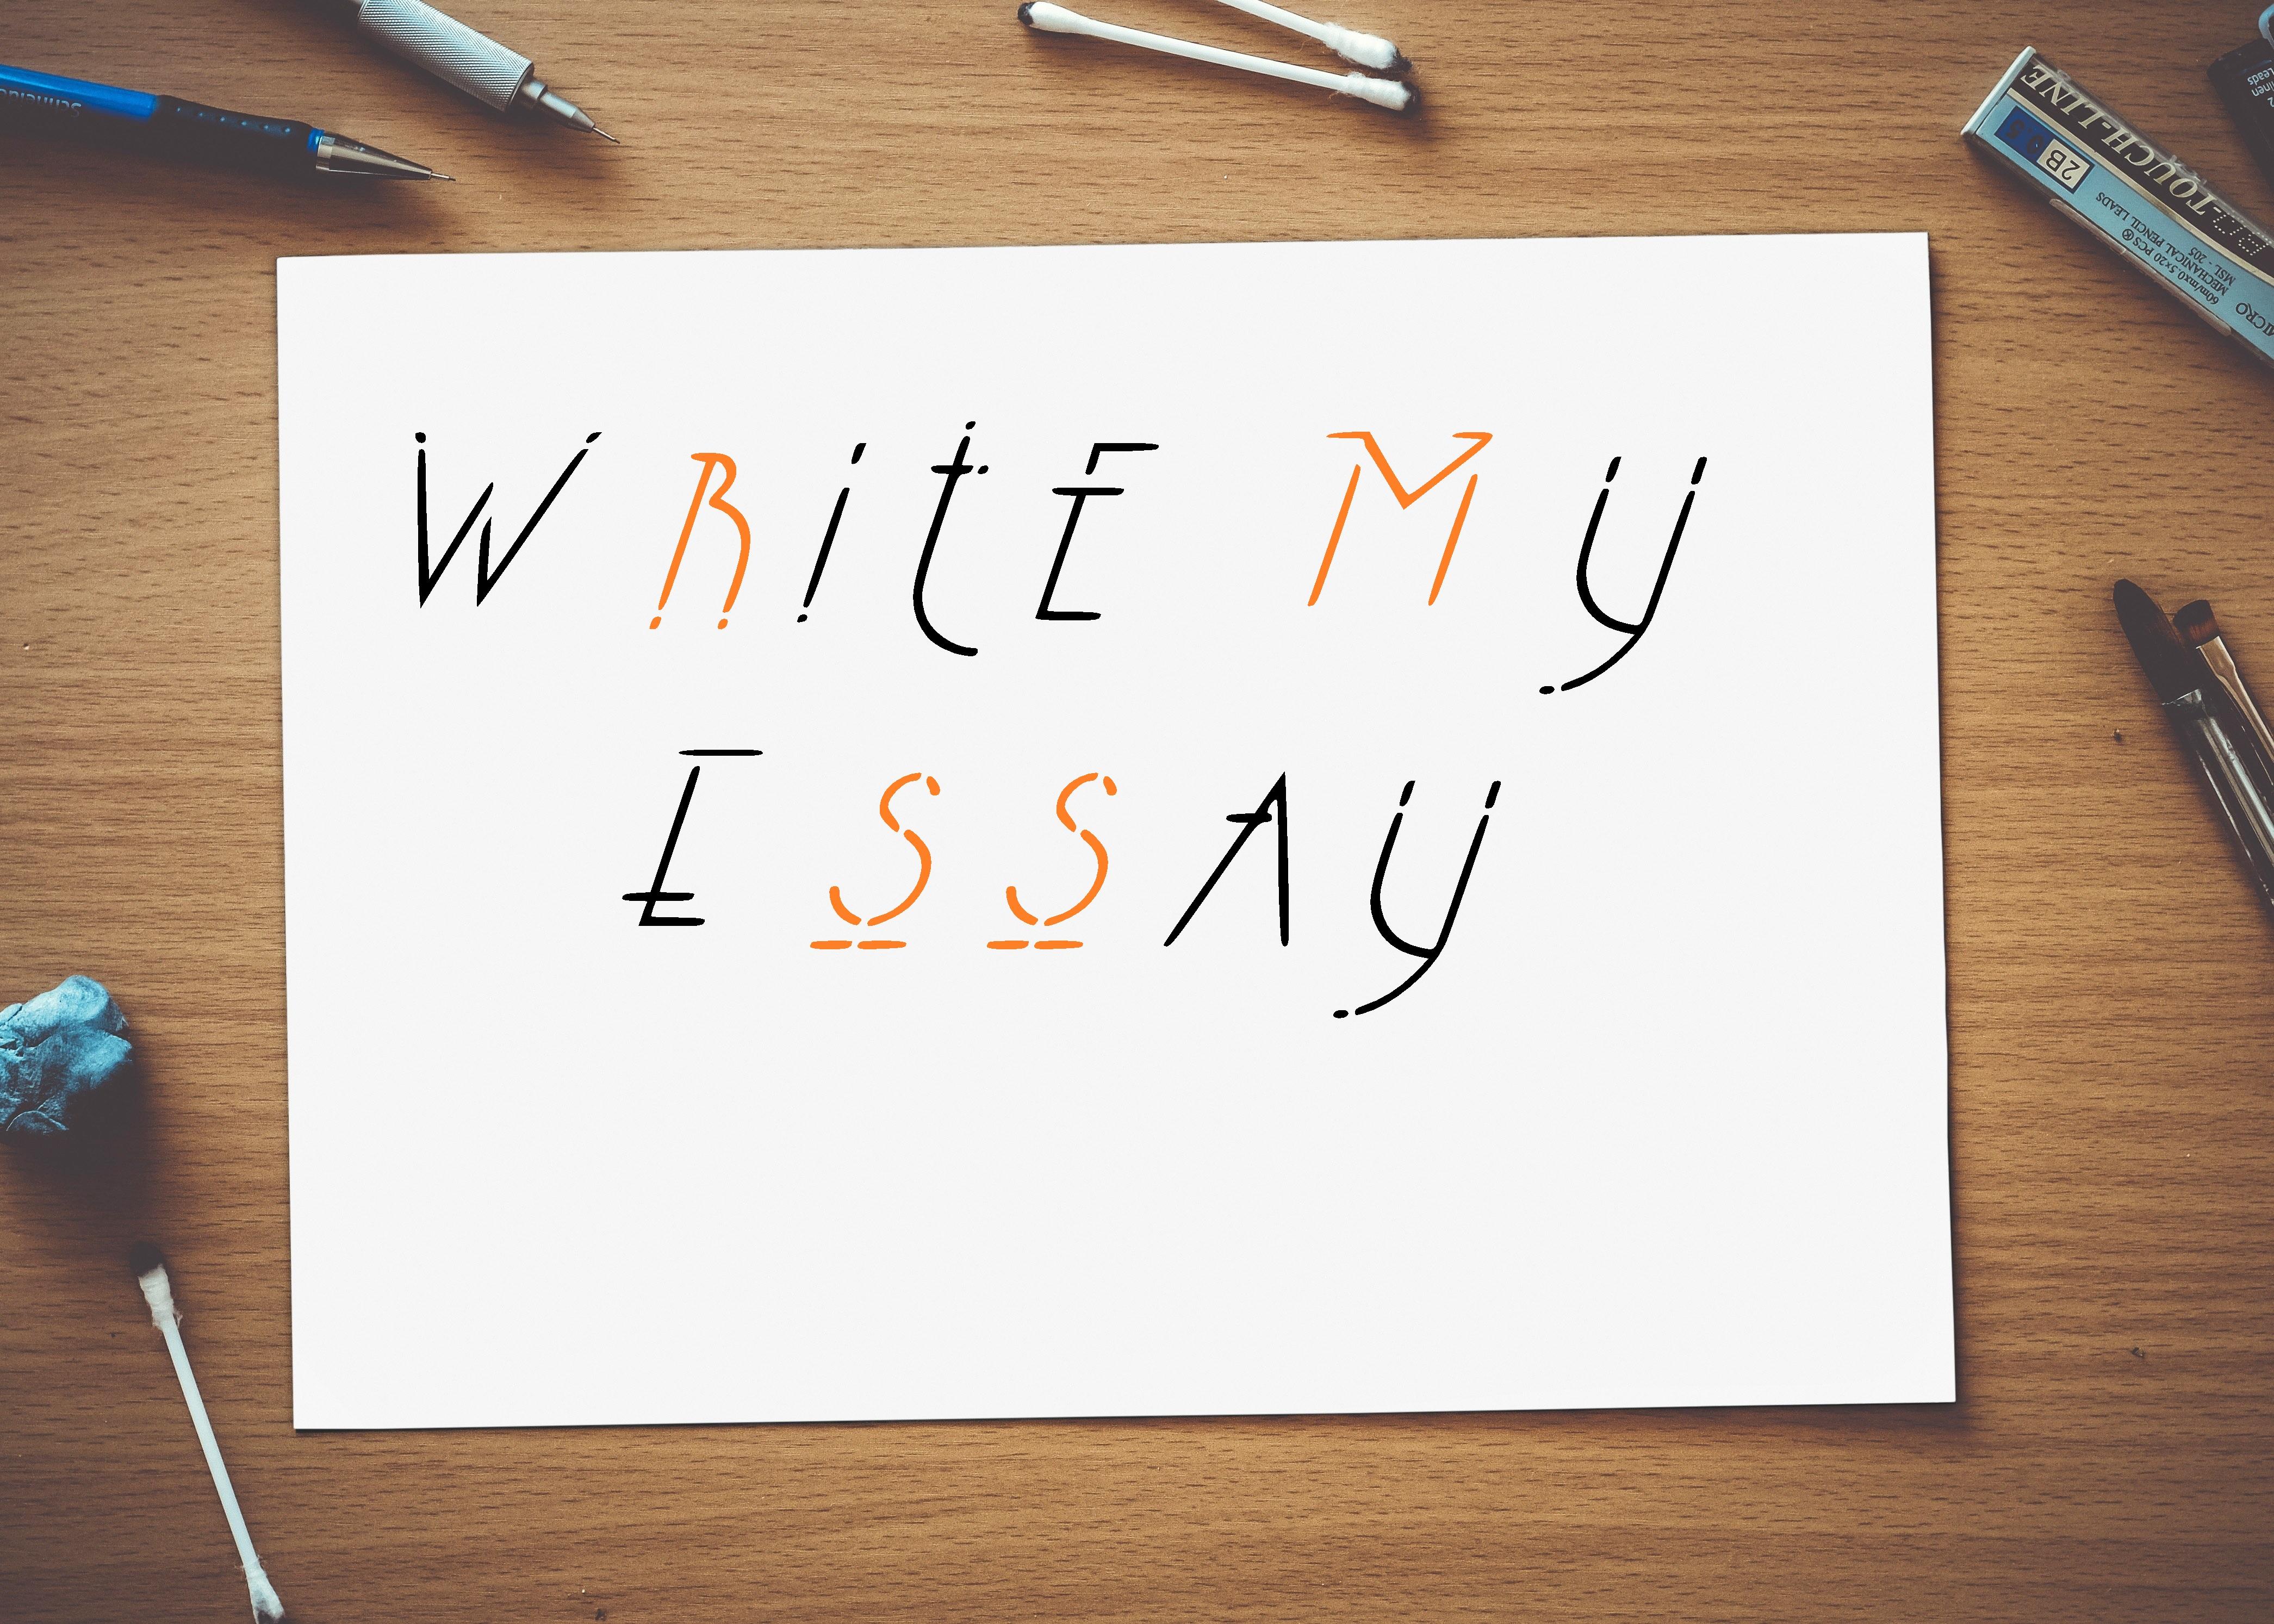 Writemyessay